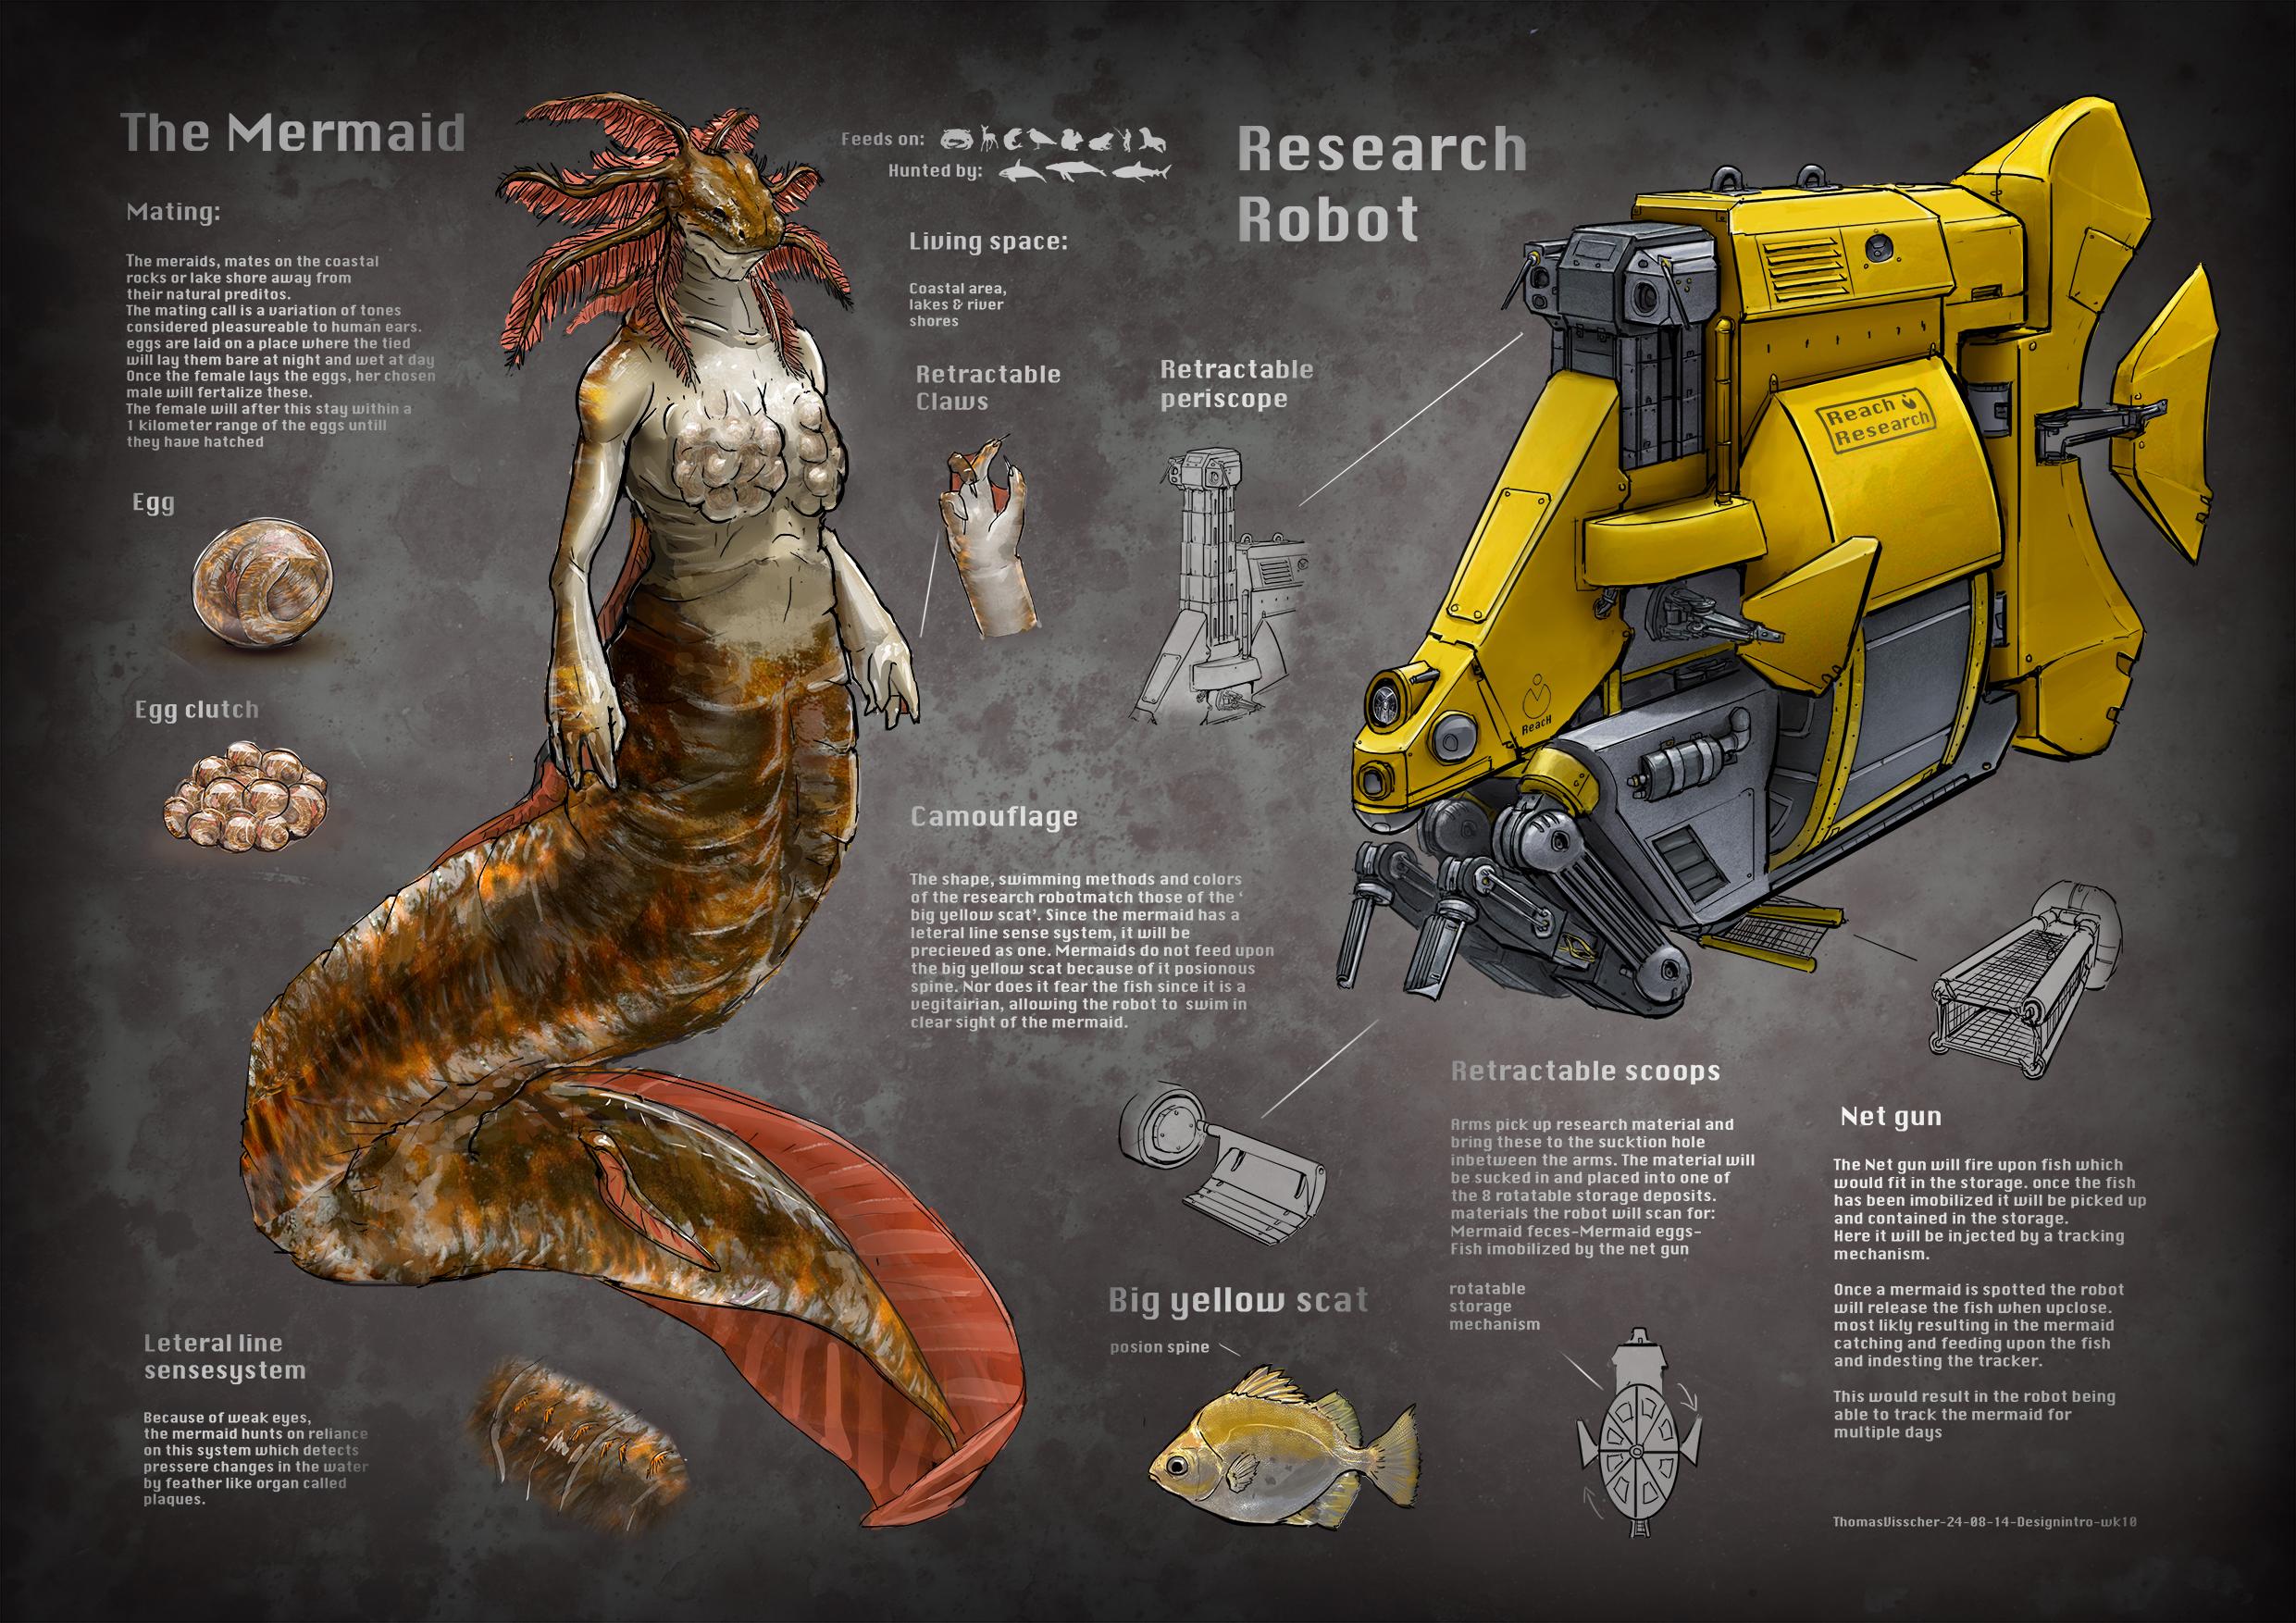 Mermaid research